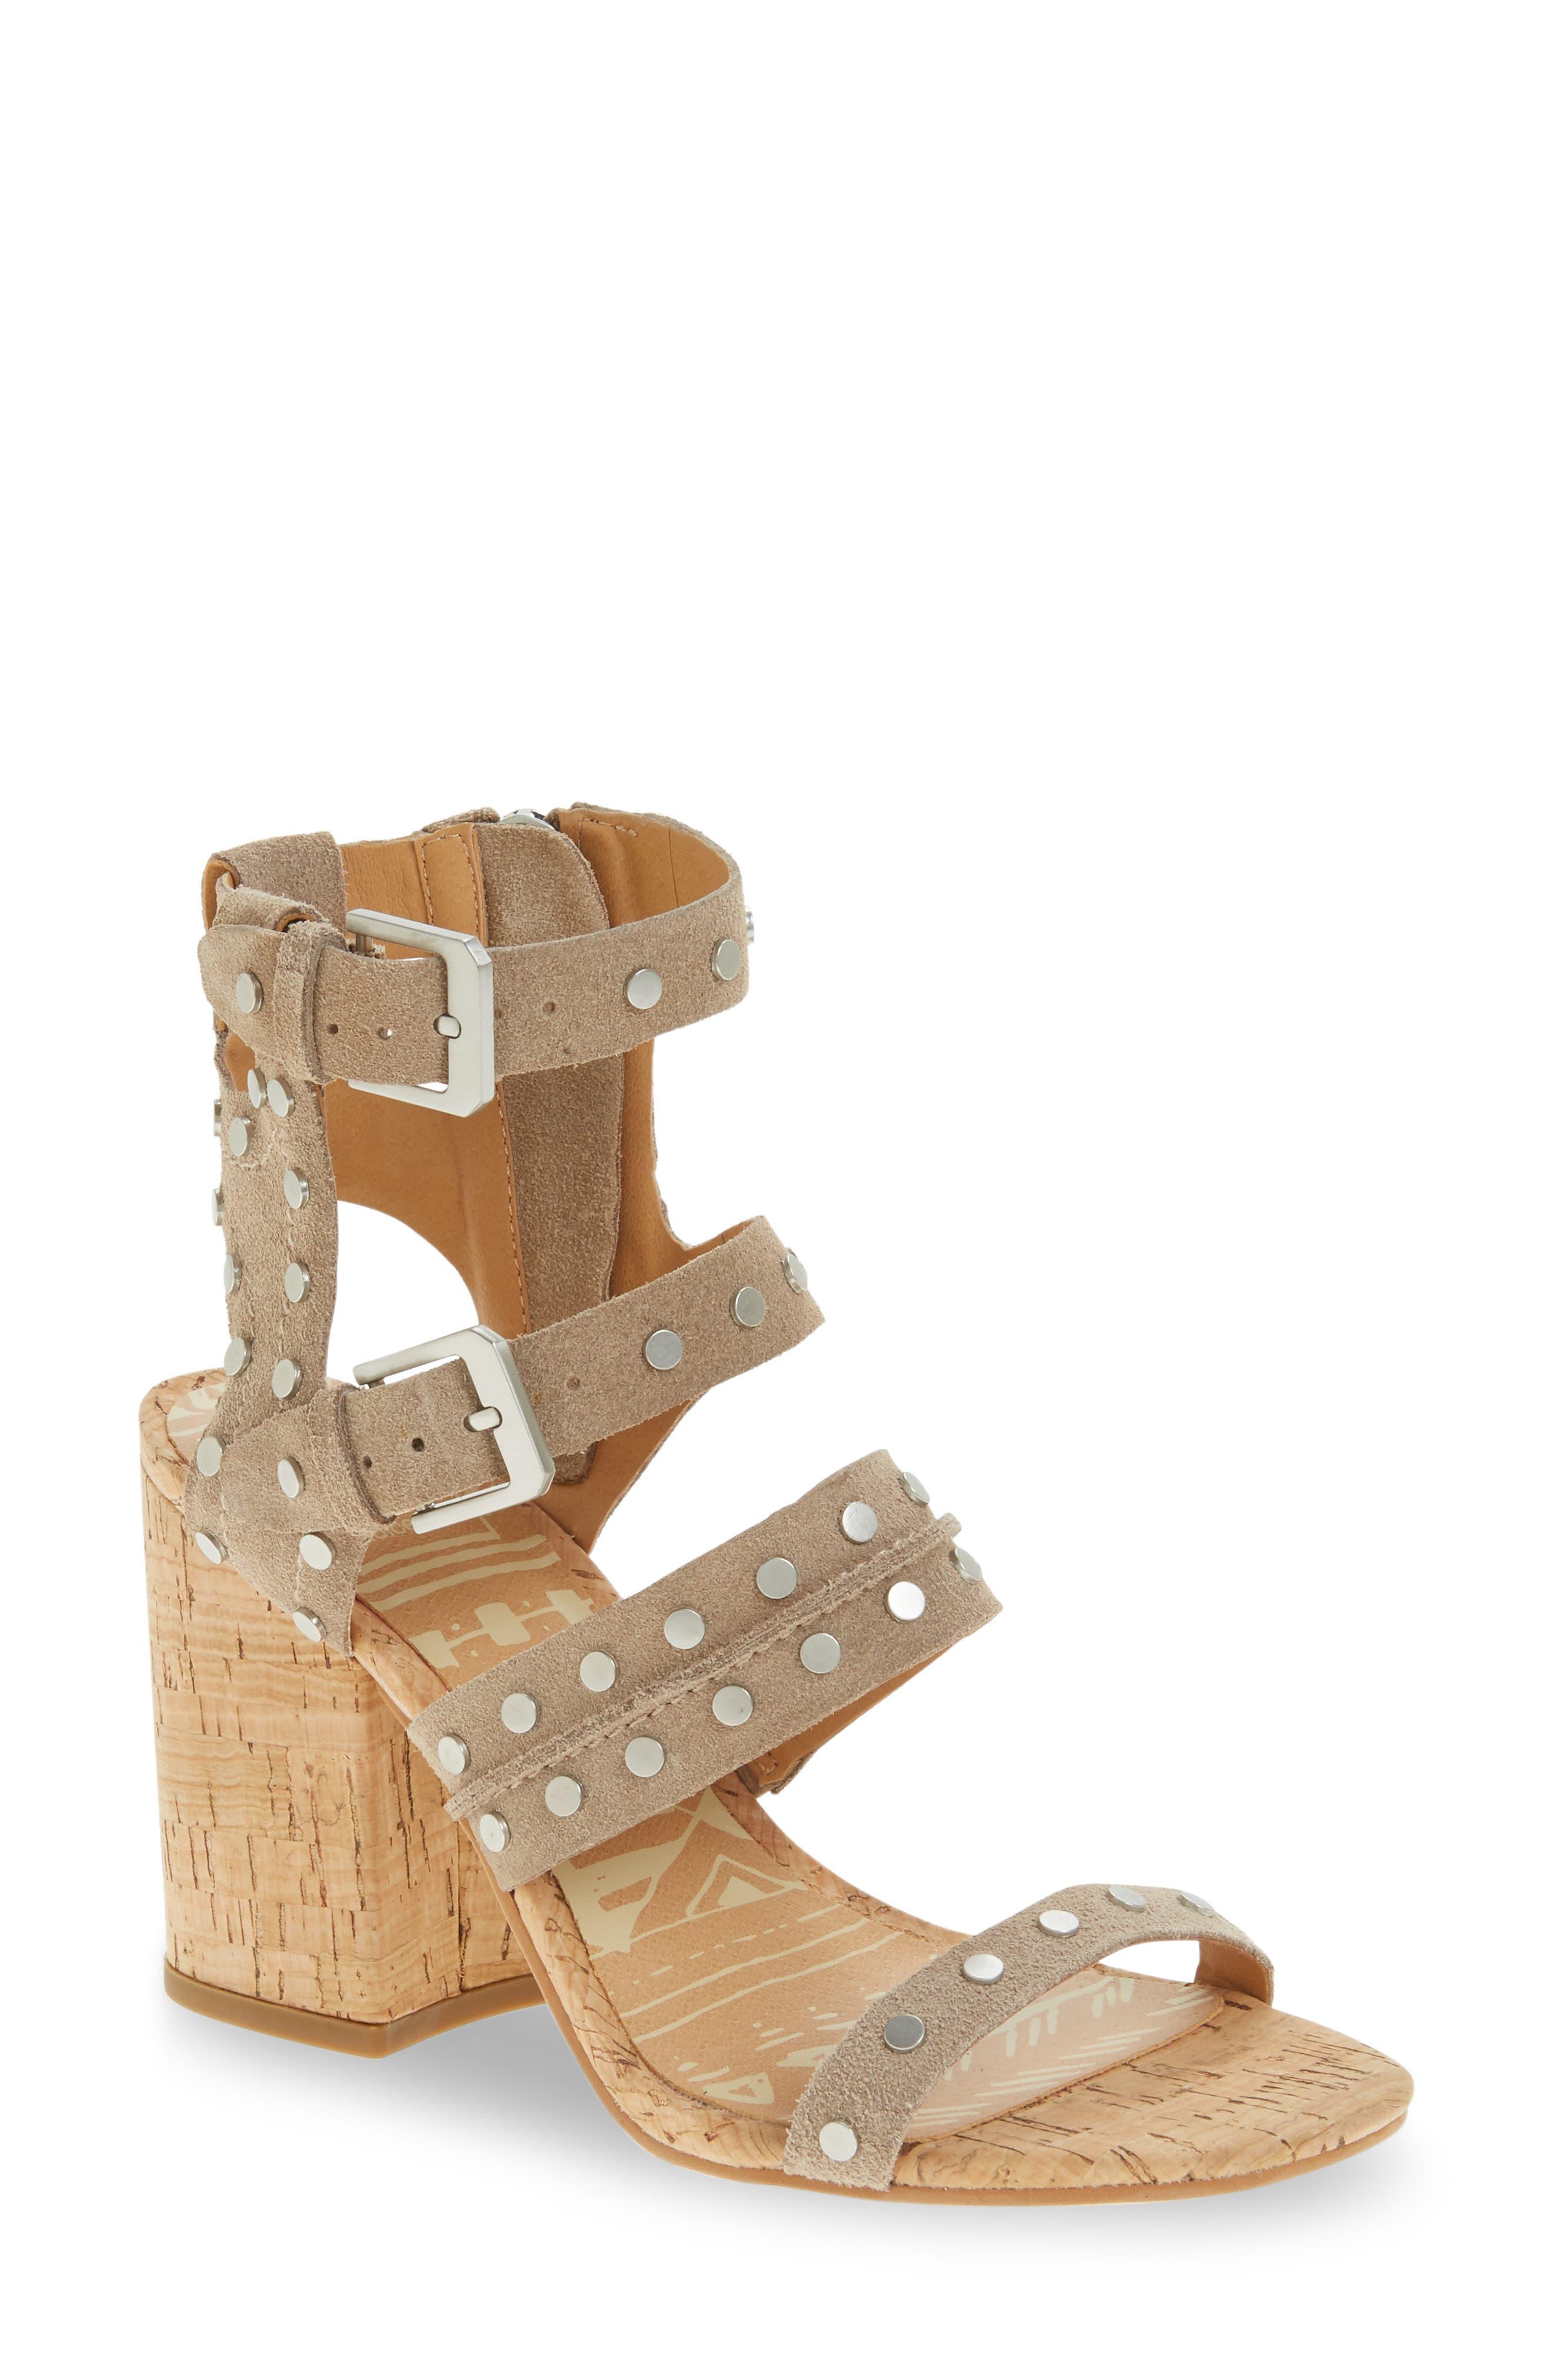 Alternate Image 1 Selected - Dolce Vita Effie Block Heel Sandal (Women)